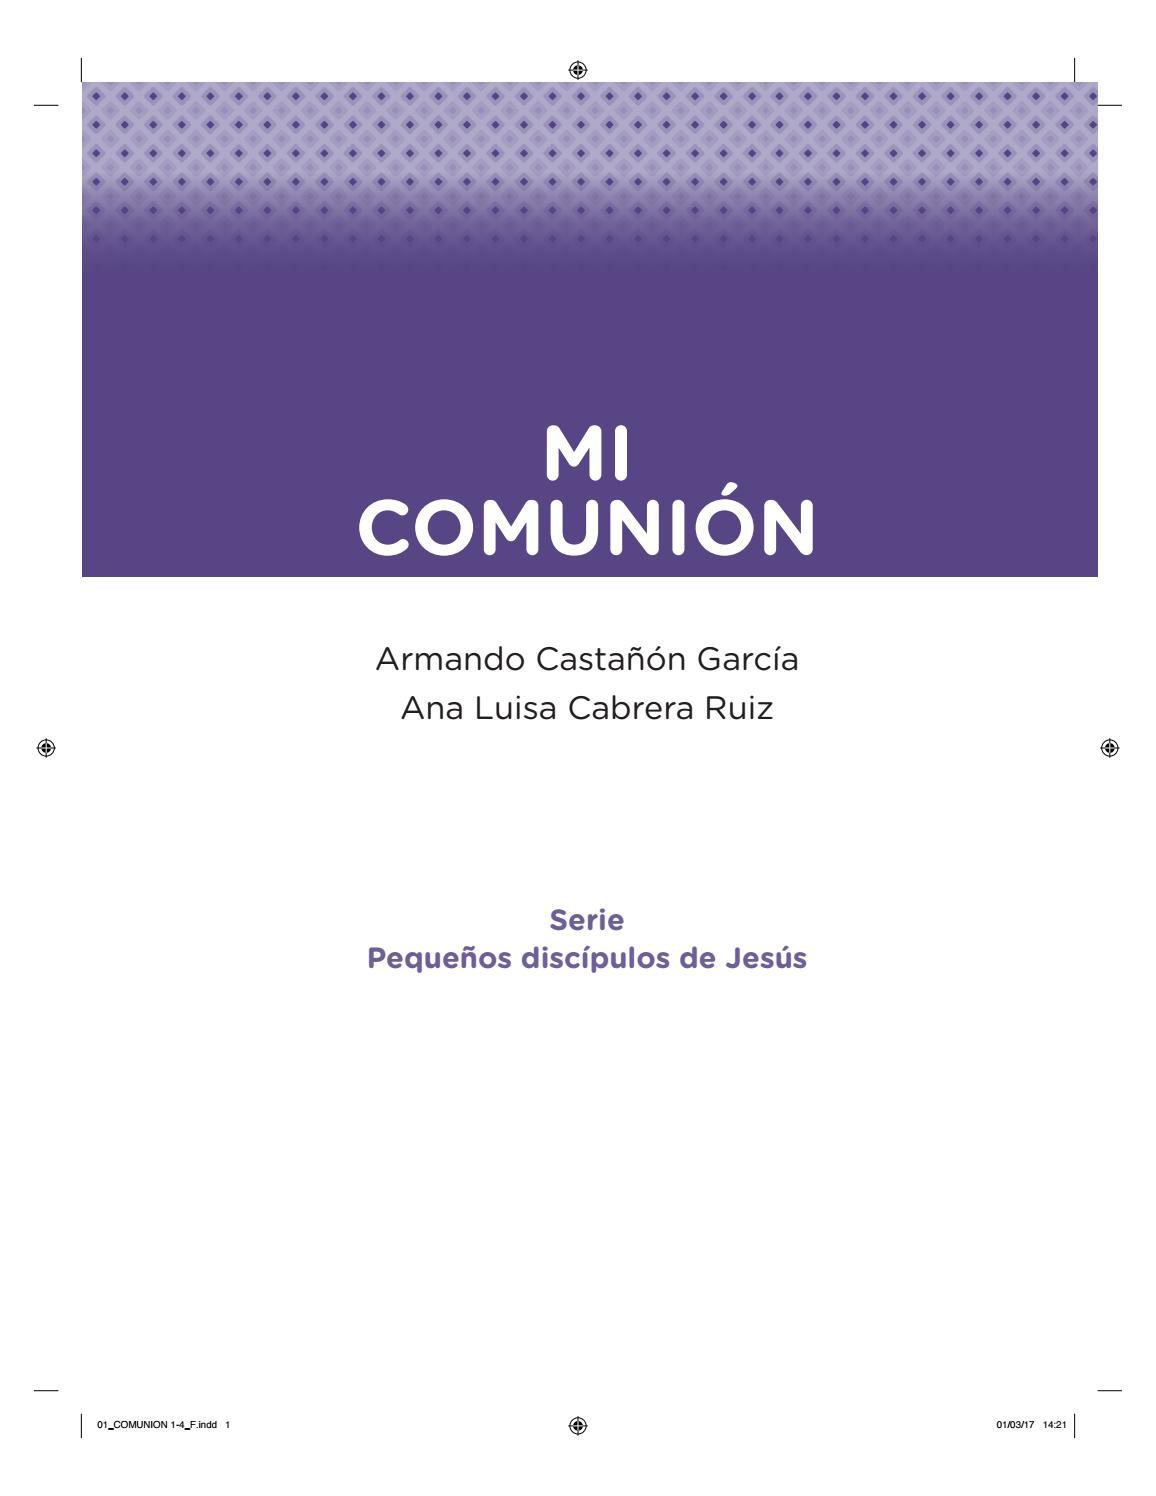 Mi comunión by Marcos huerta hernandez - issuu